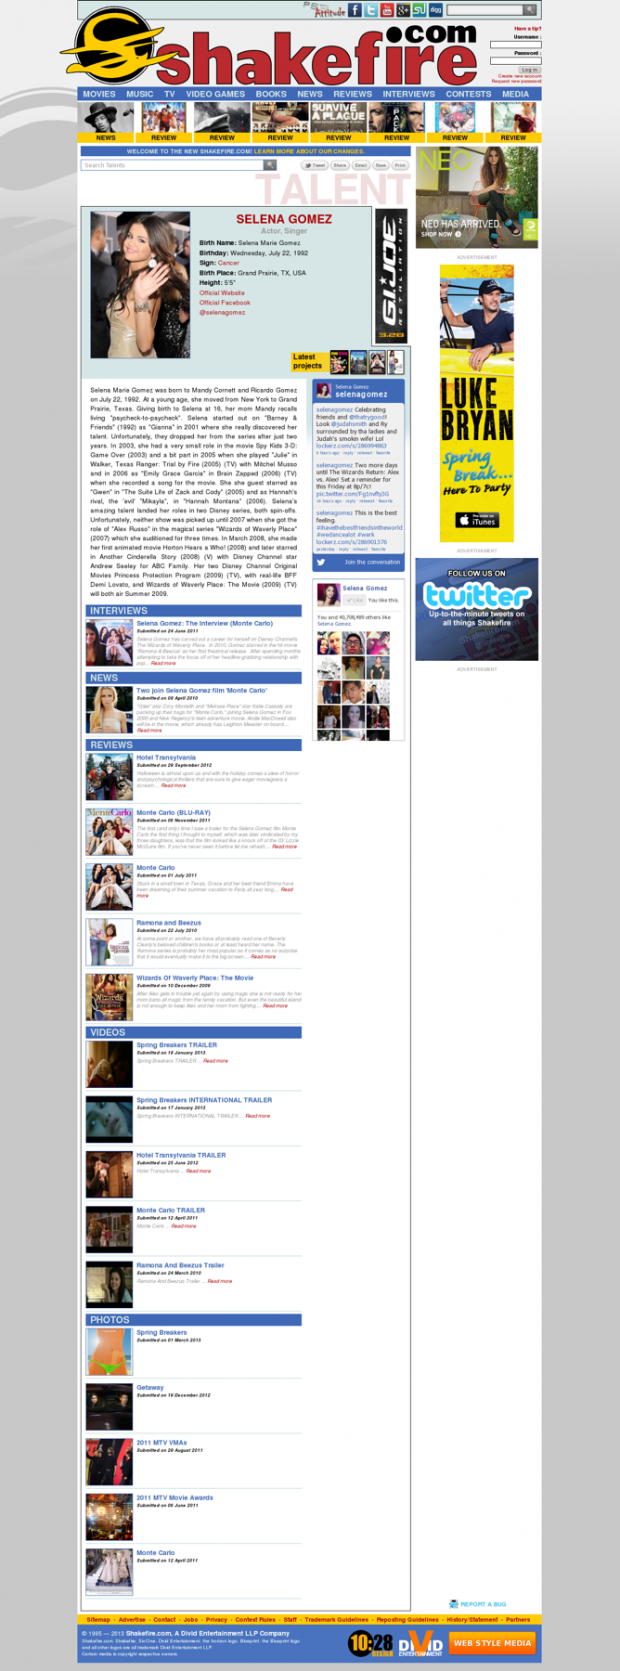 Shakefire.com Talent Page